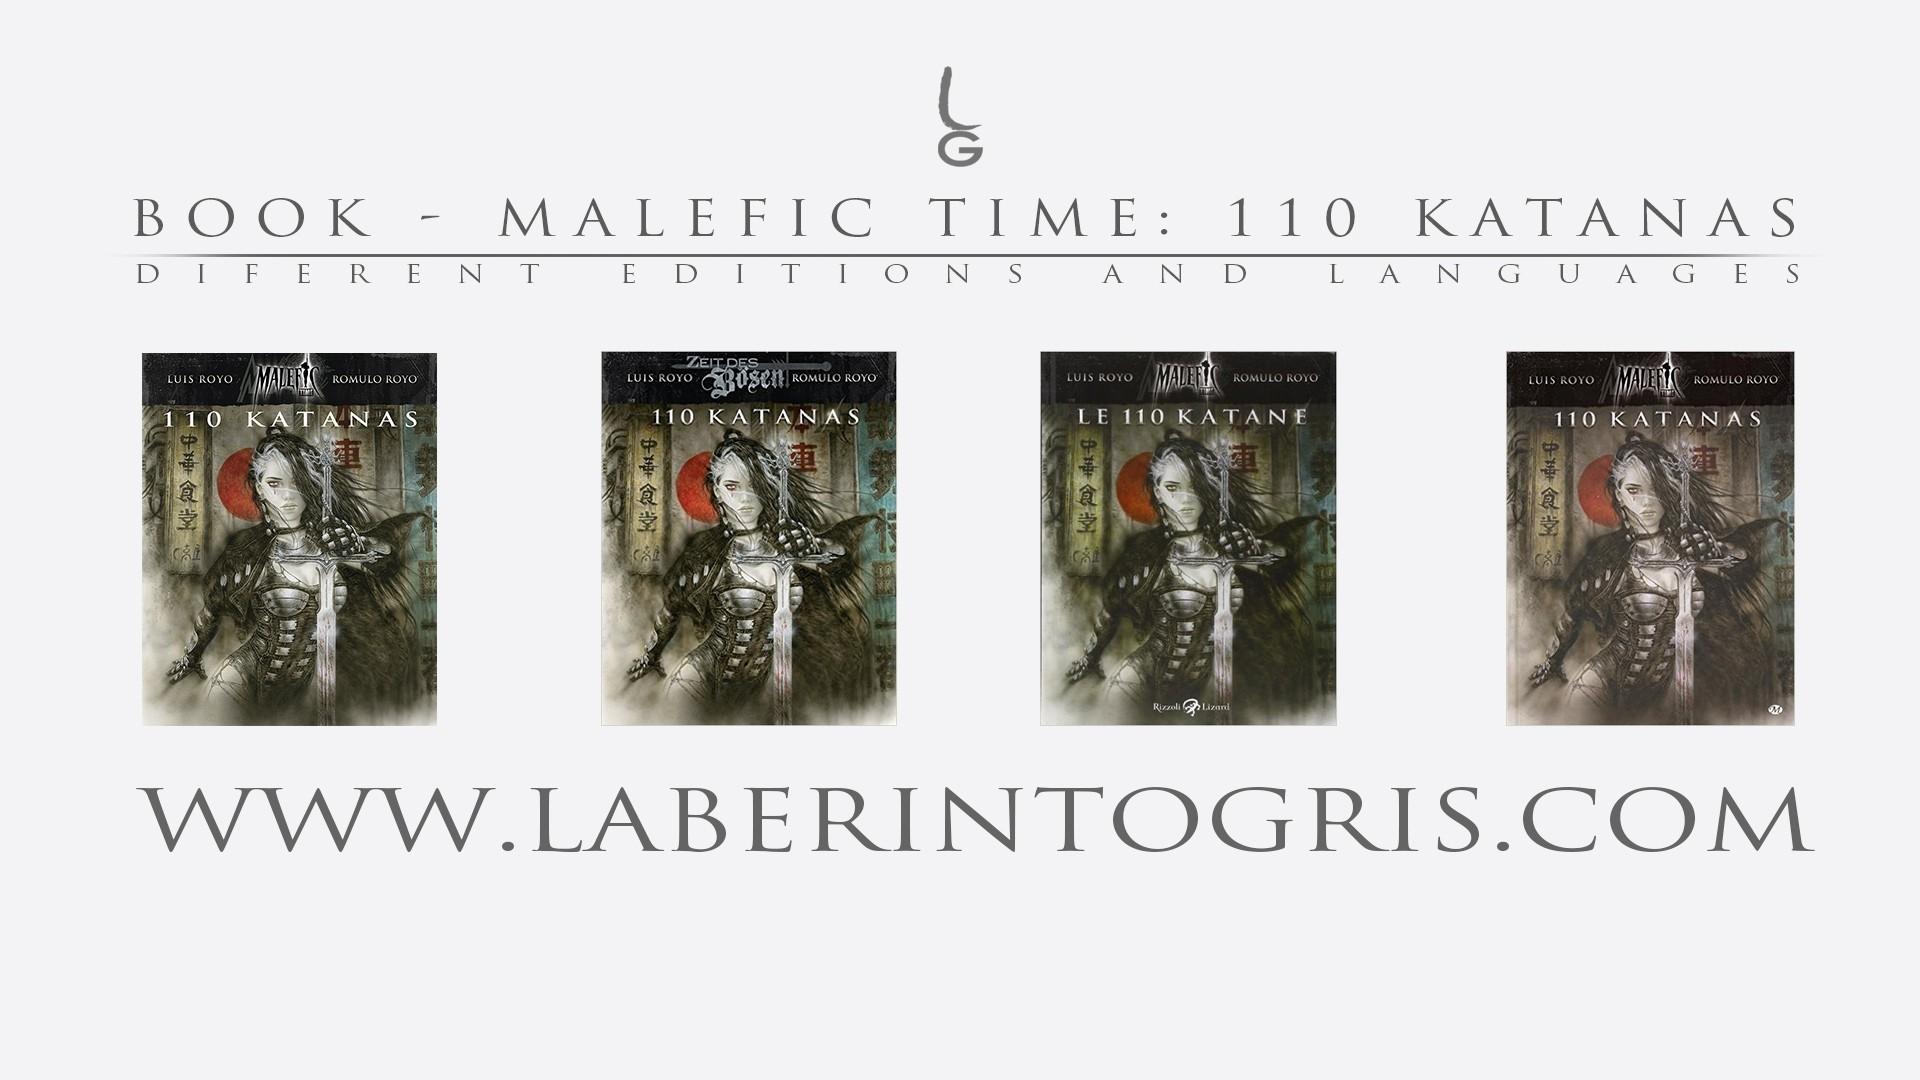 Malefic Time - 110 Katanas